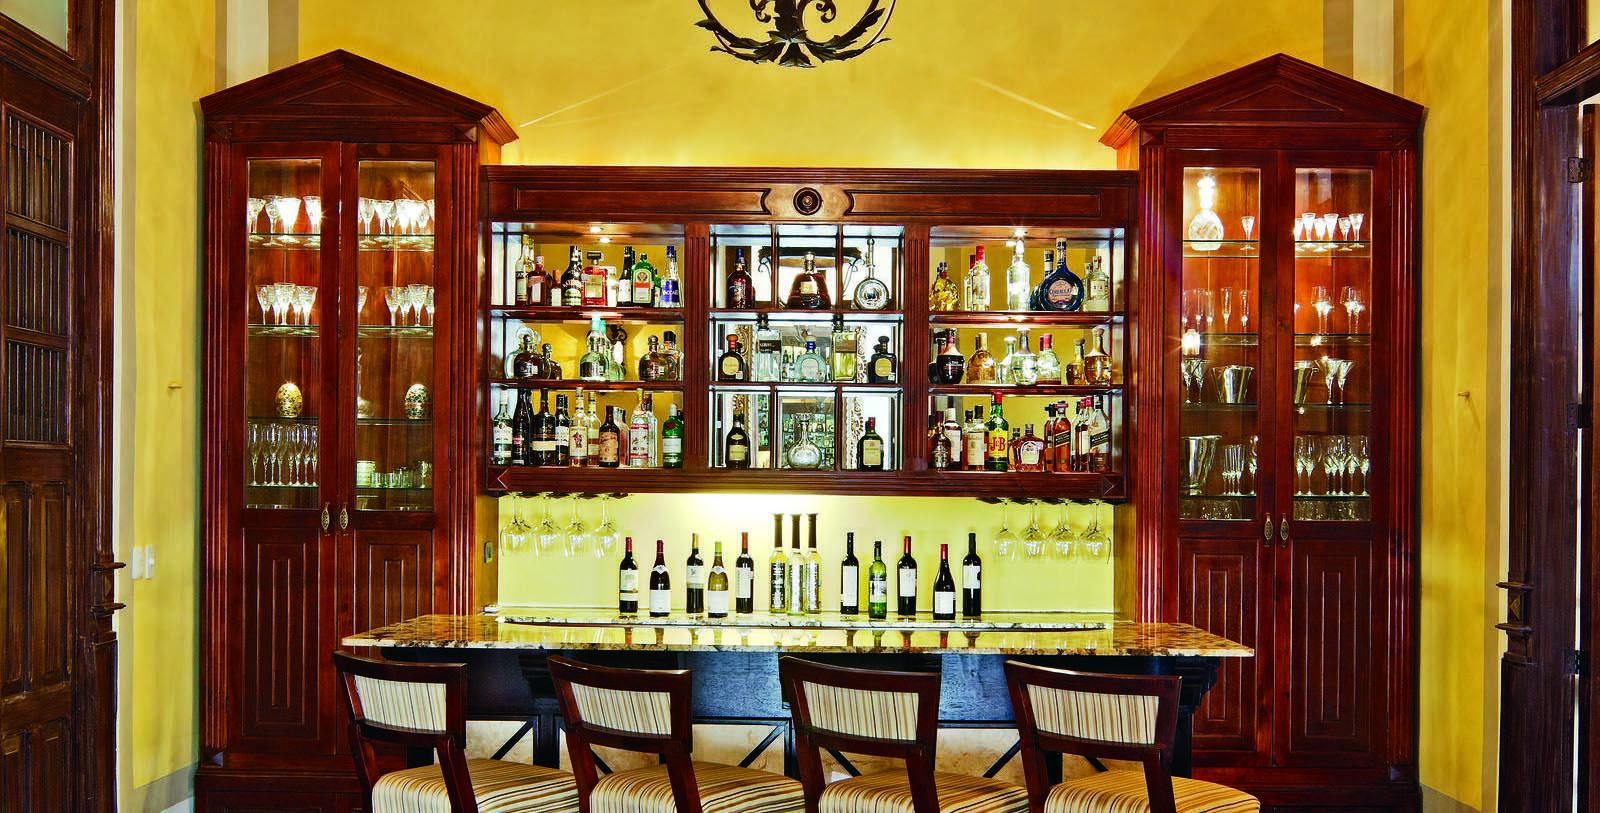 Image of bar area Casa Lecanda, 1900s, Member of Historic Hotels Worldwide, in Merida, Mexico, Taste